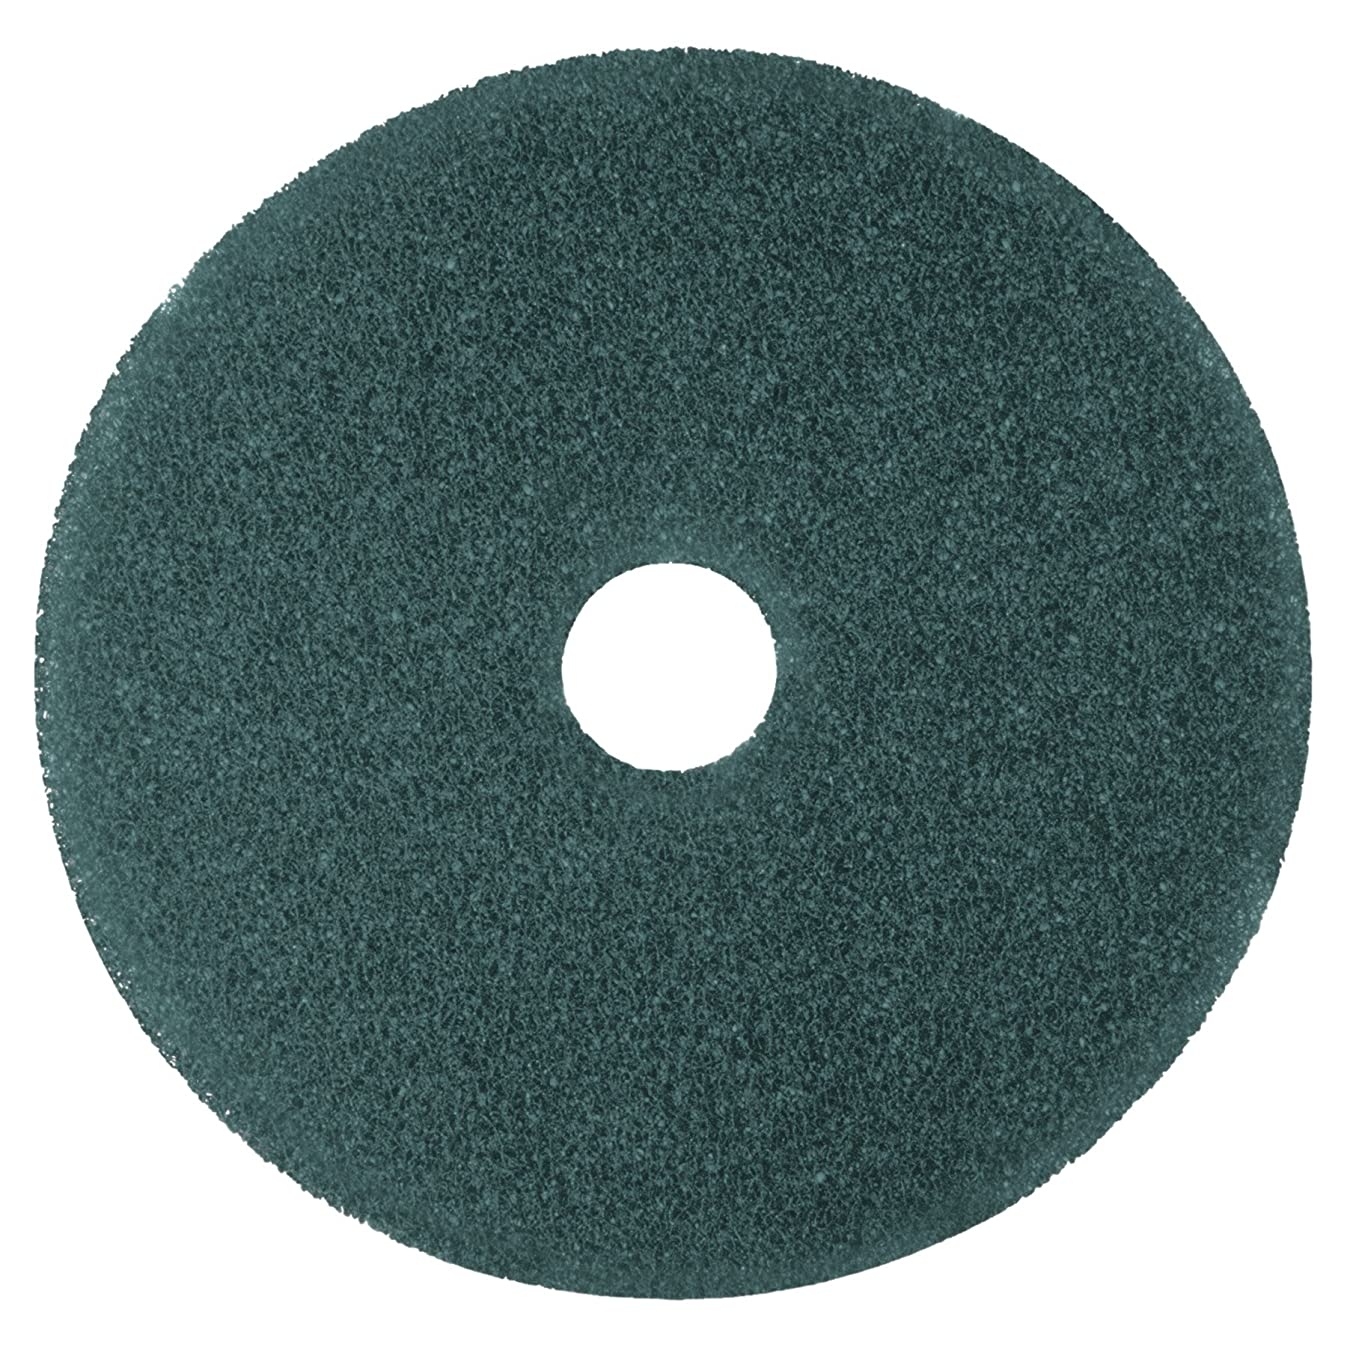 3M Blue Cleaner Pad 5300, 17